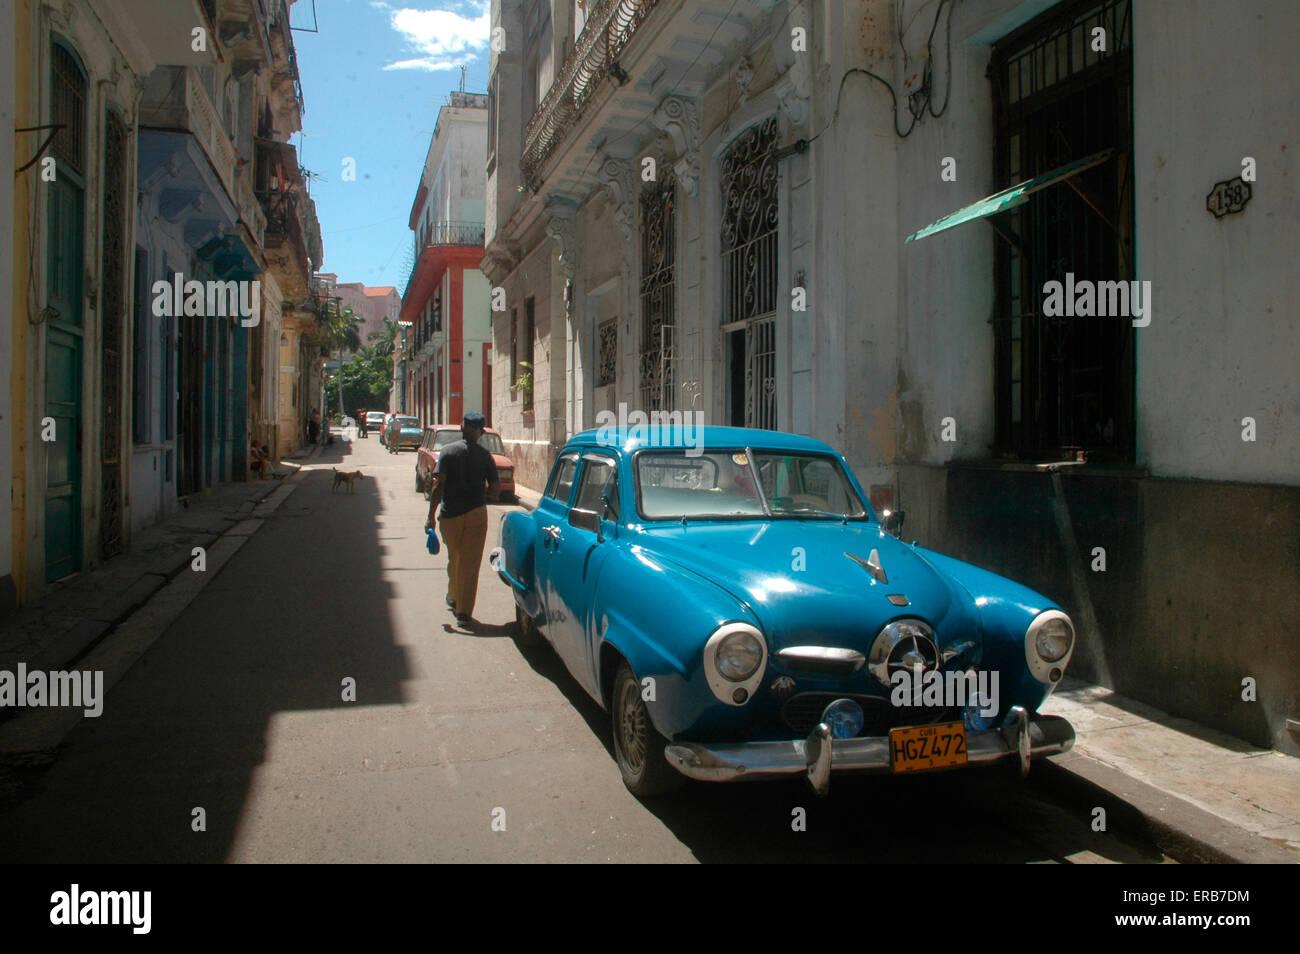 Oldtimer, Havanna, Kuba. - Stock Image